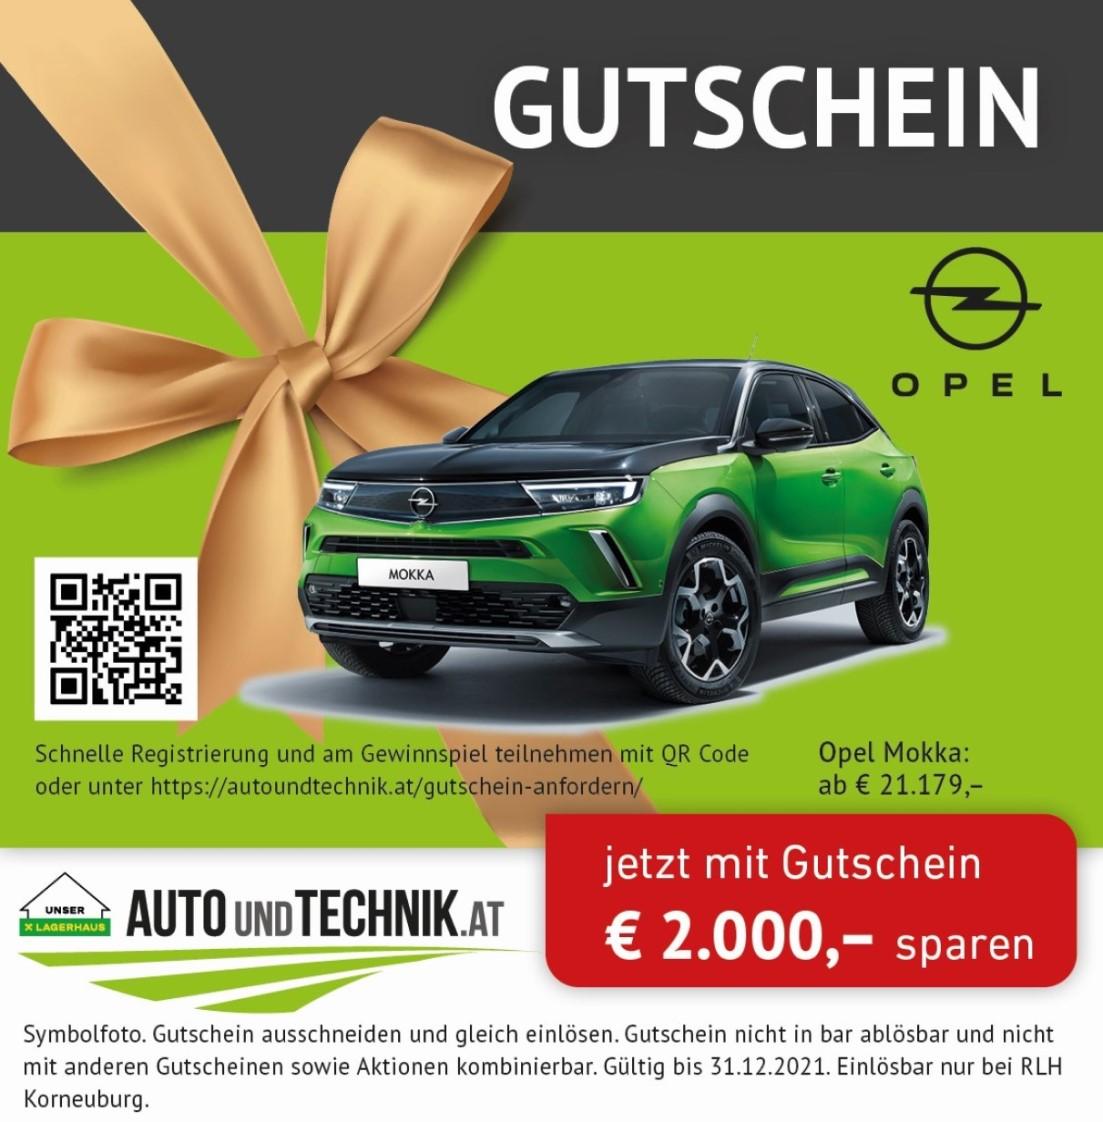 Gutschein-Opel-Mokka-image-01